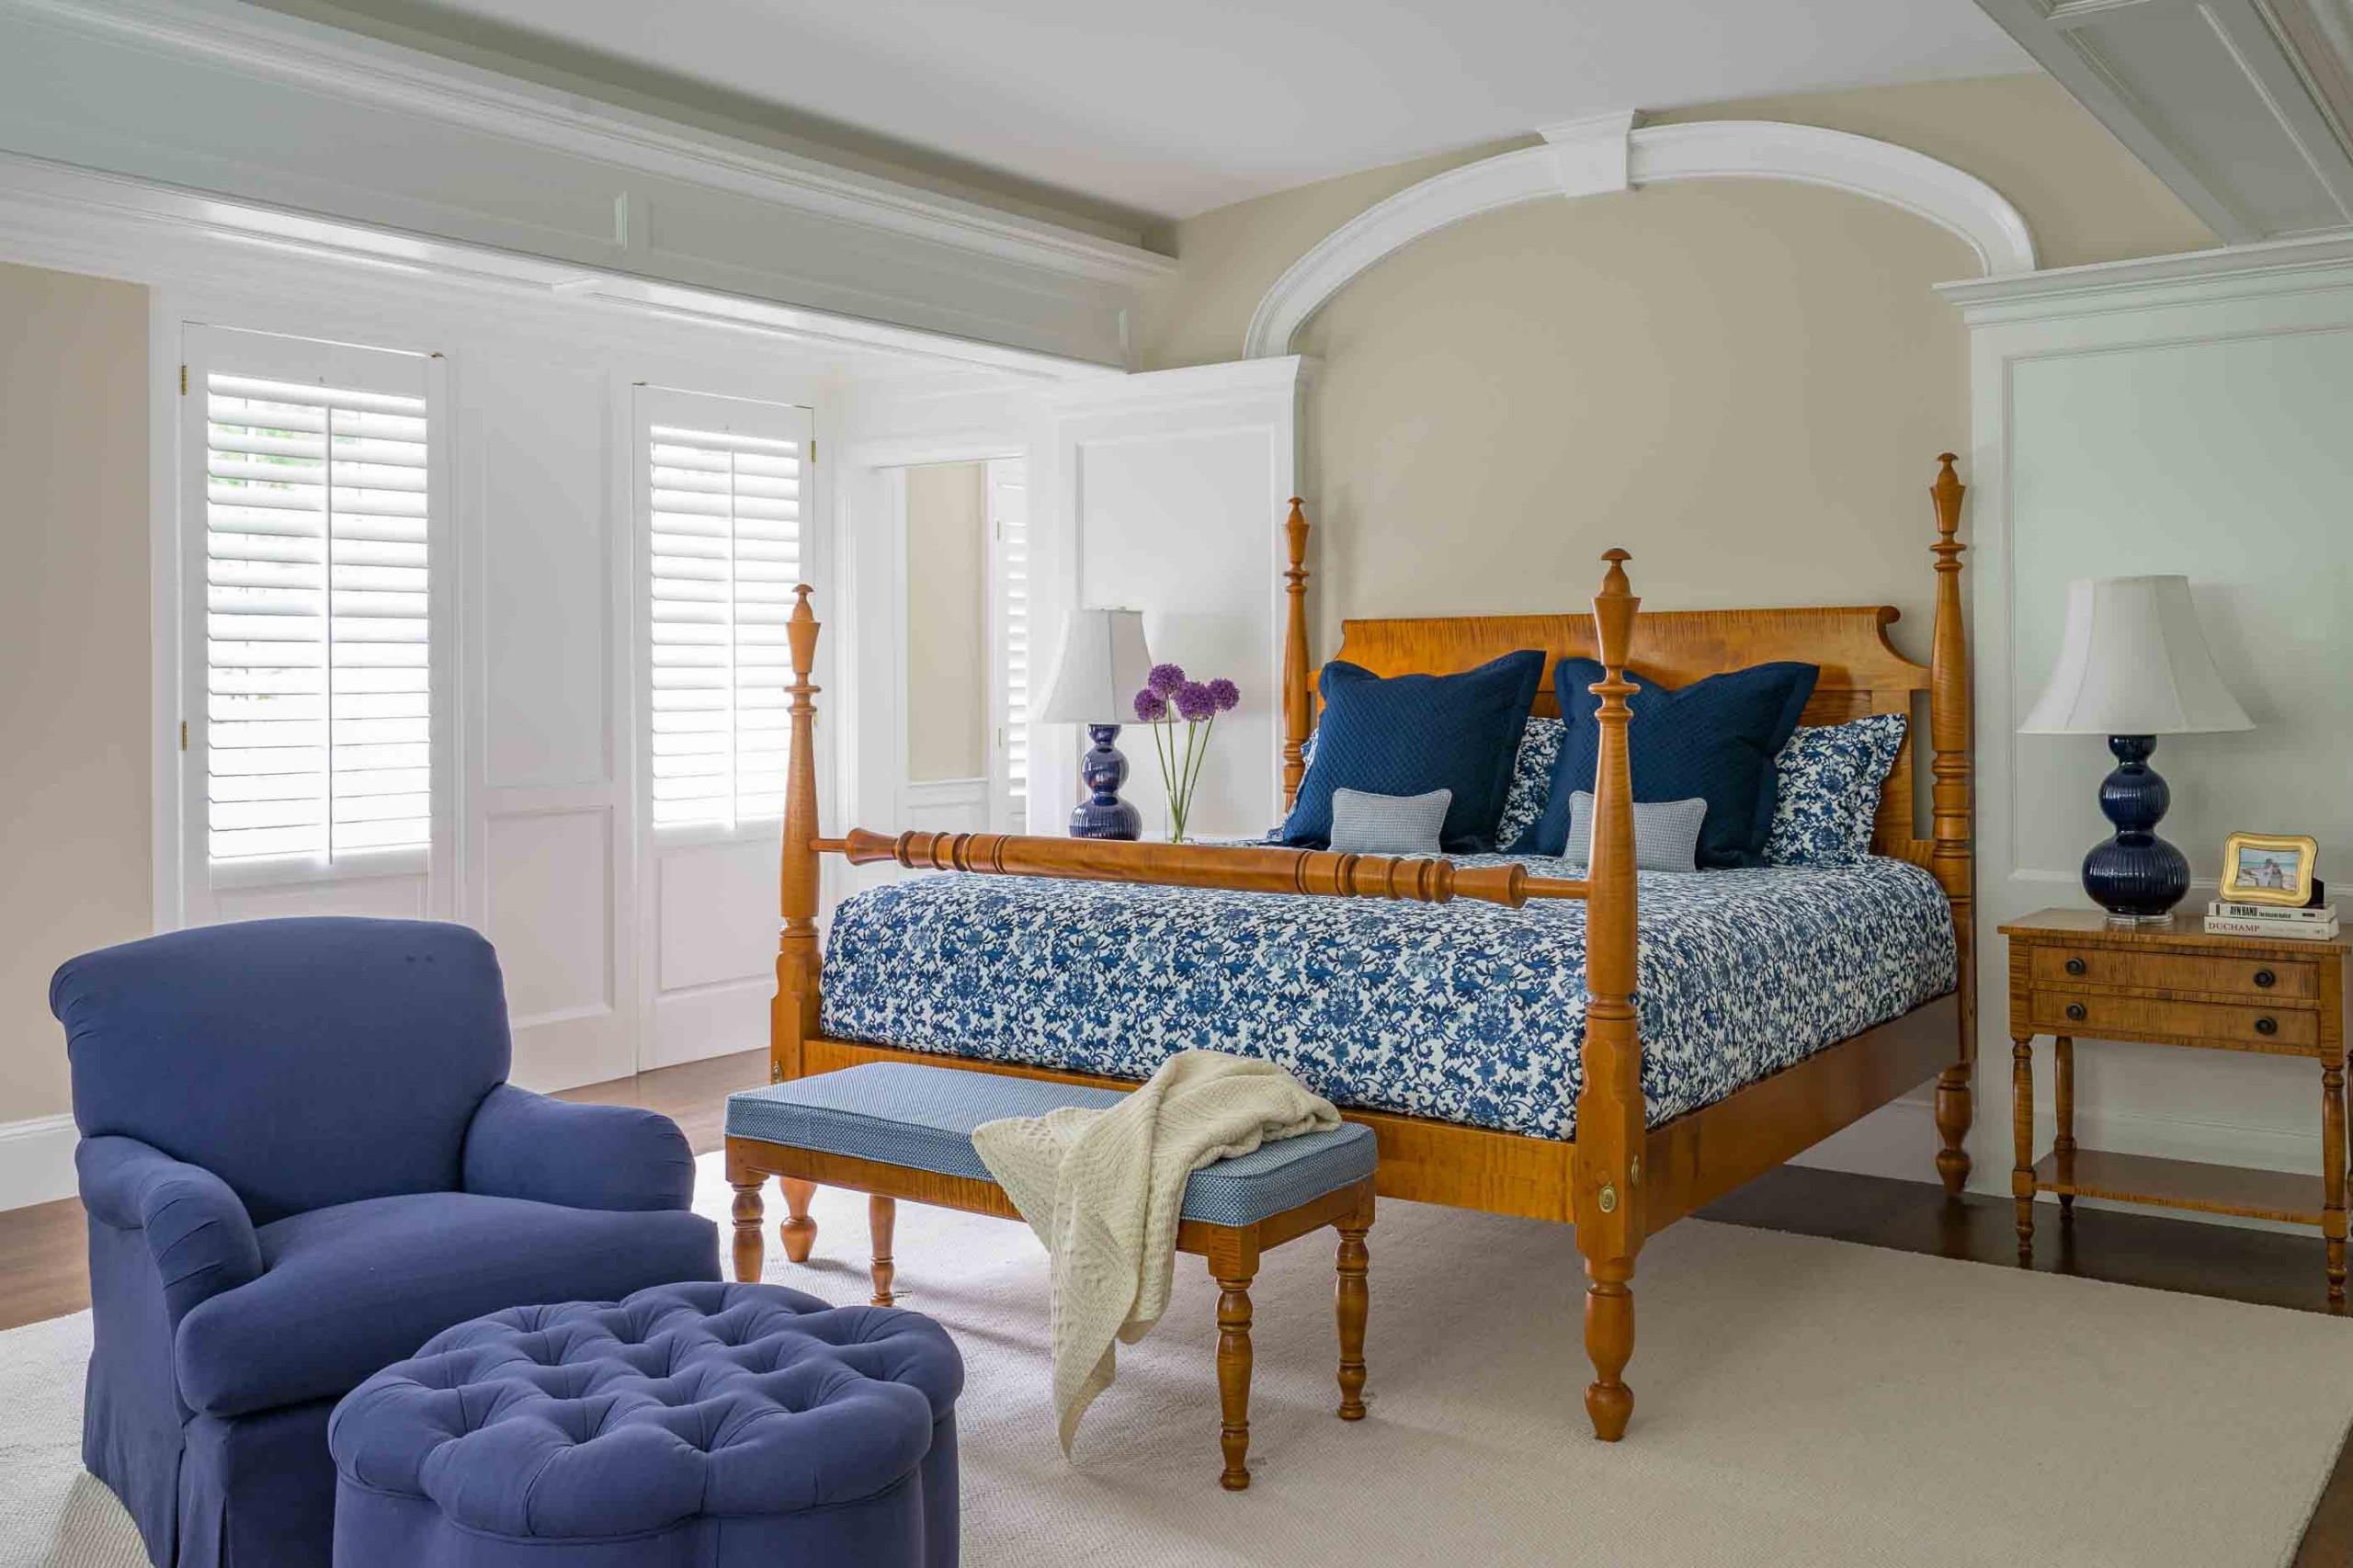 18 Beautiful Guest Bedroom Pictures Ideas October 2020 Houzz